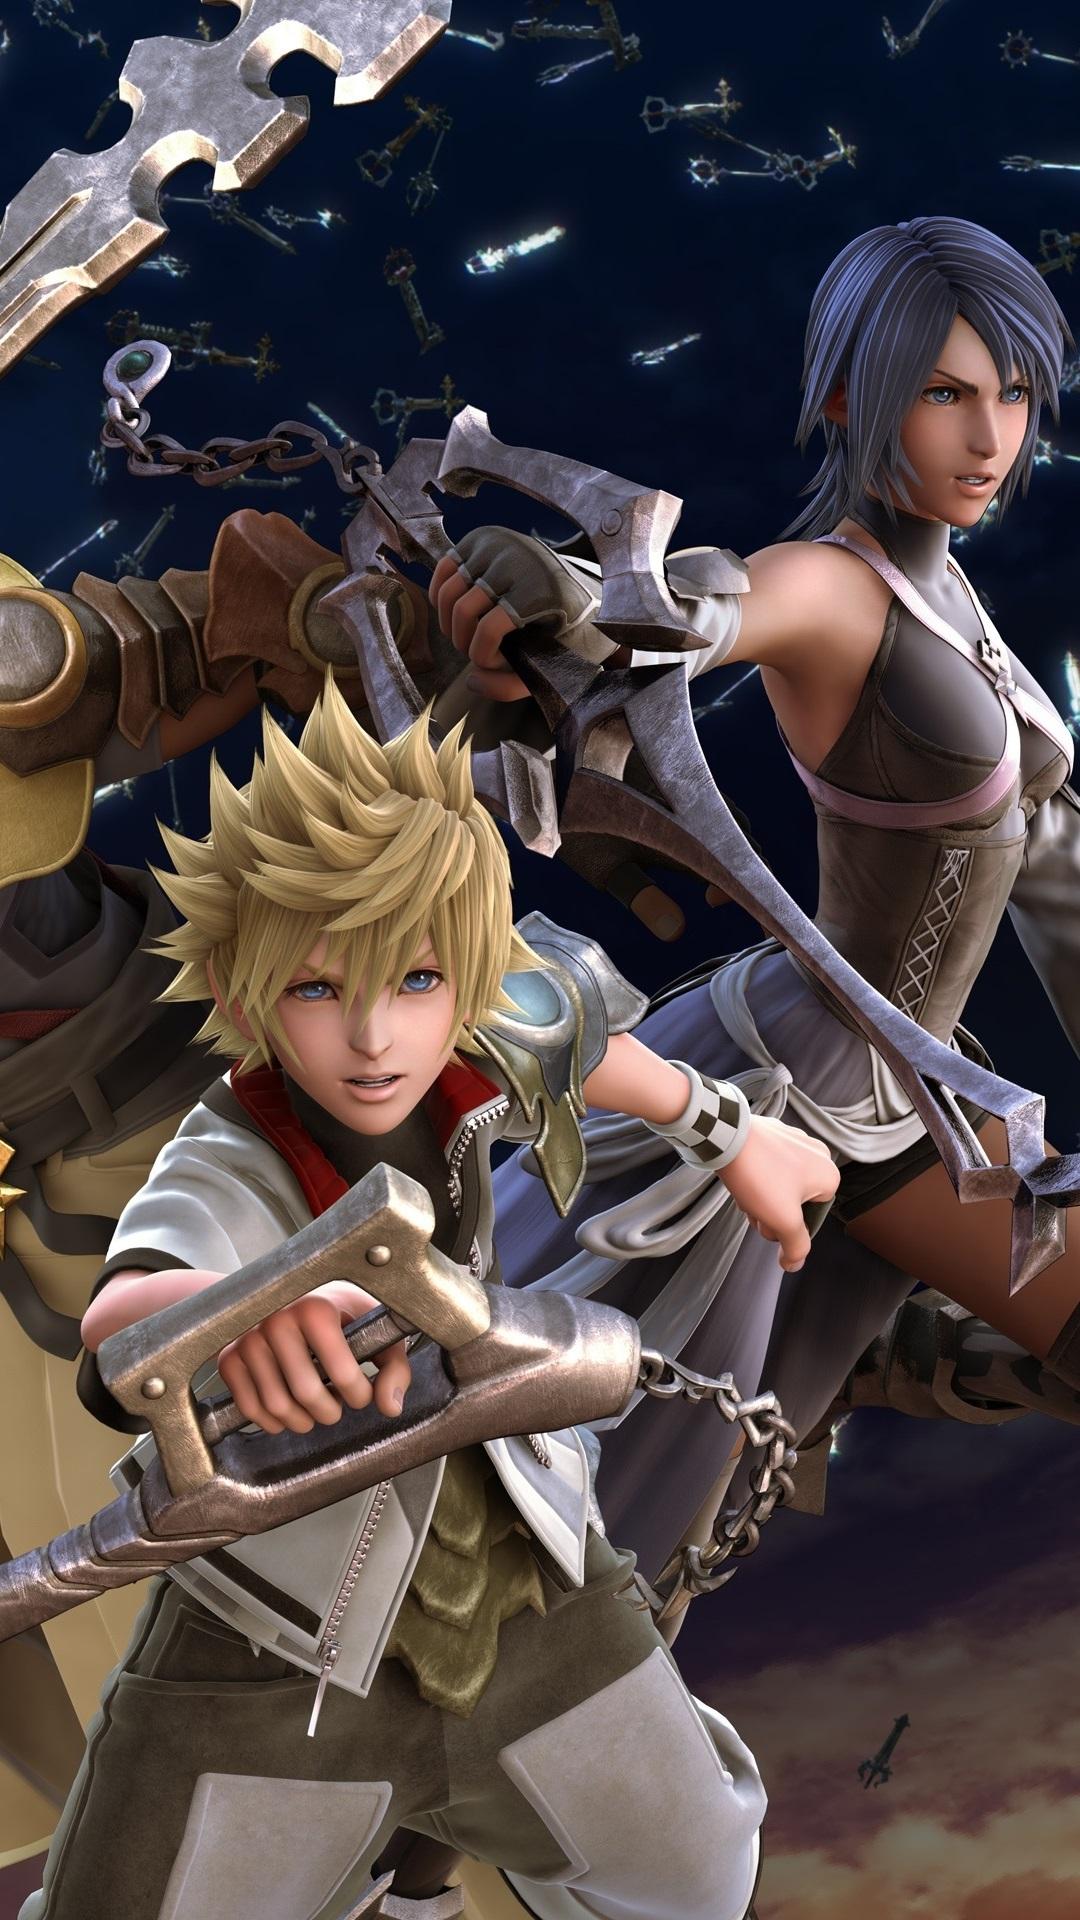 Final Fantasy Xiv 2012 Hd 1080x1920 Iphone 8 7 6 6s Plus